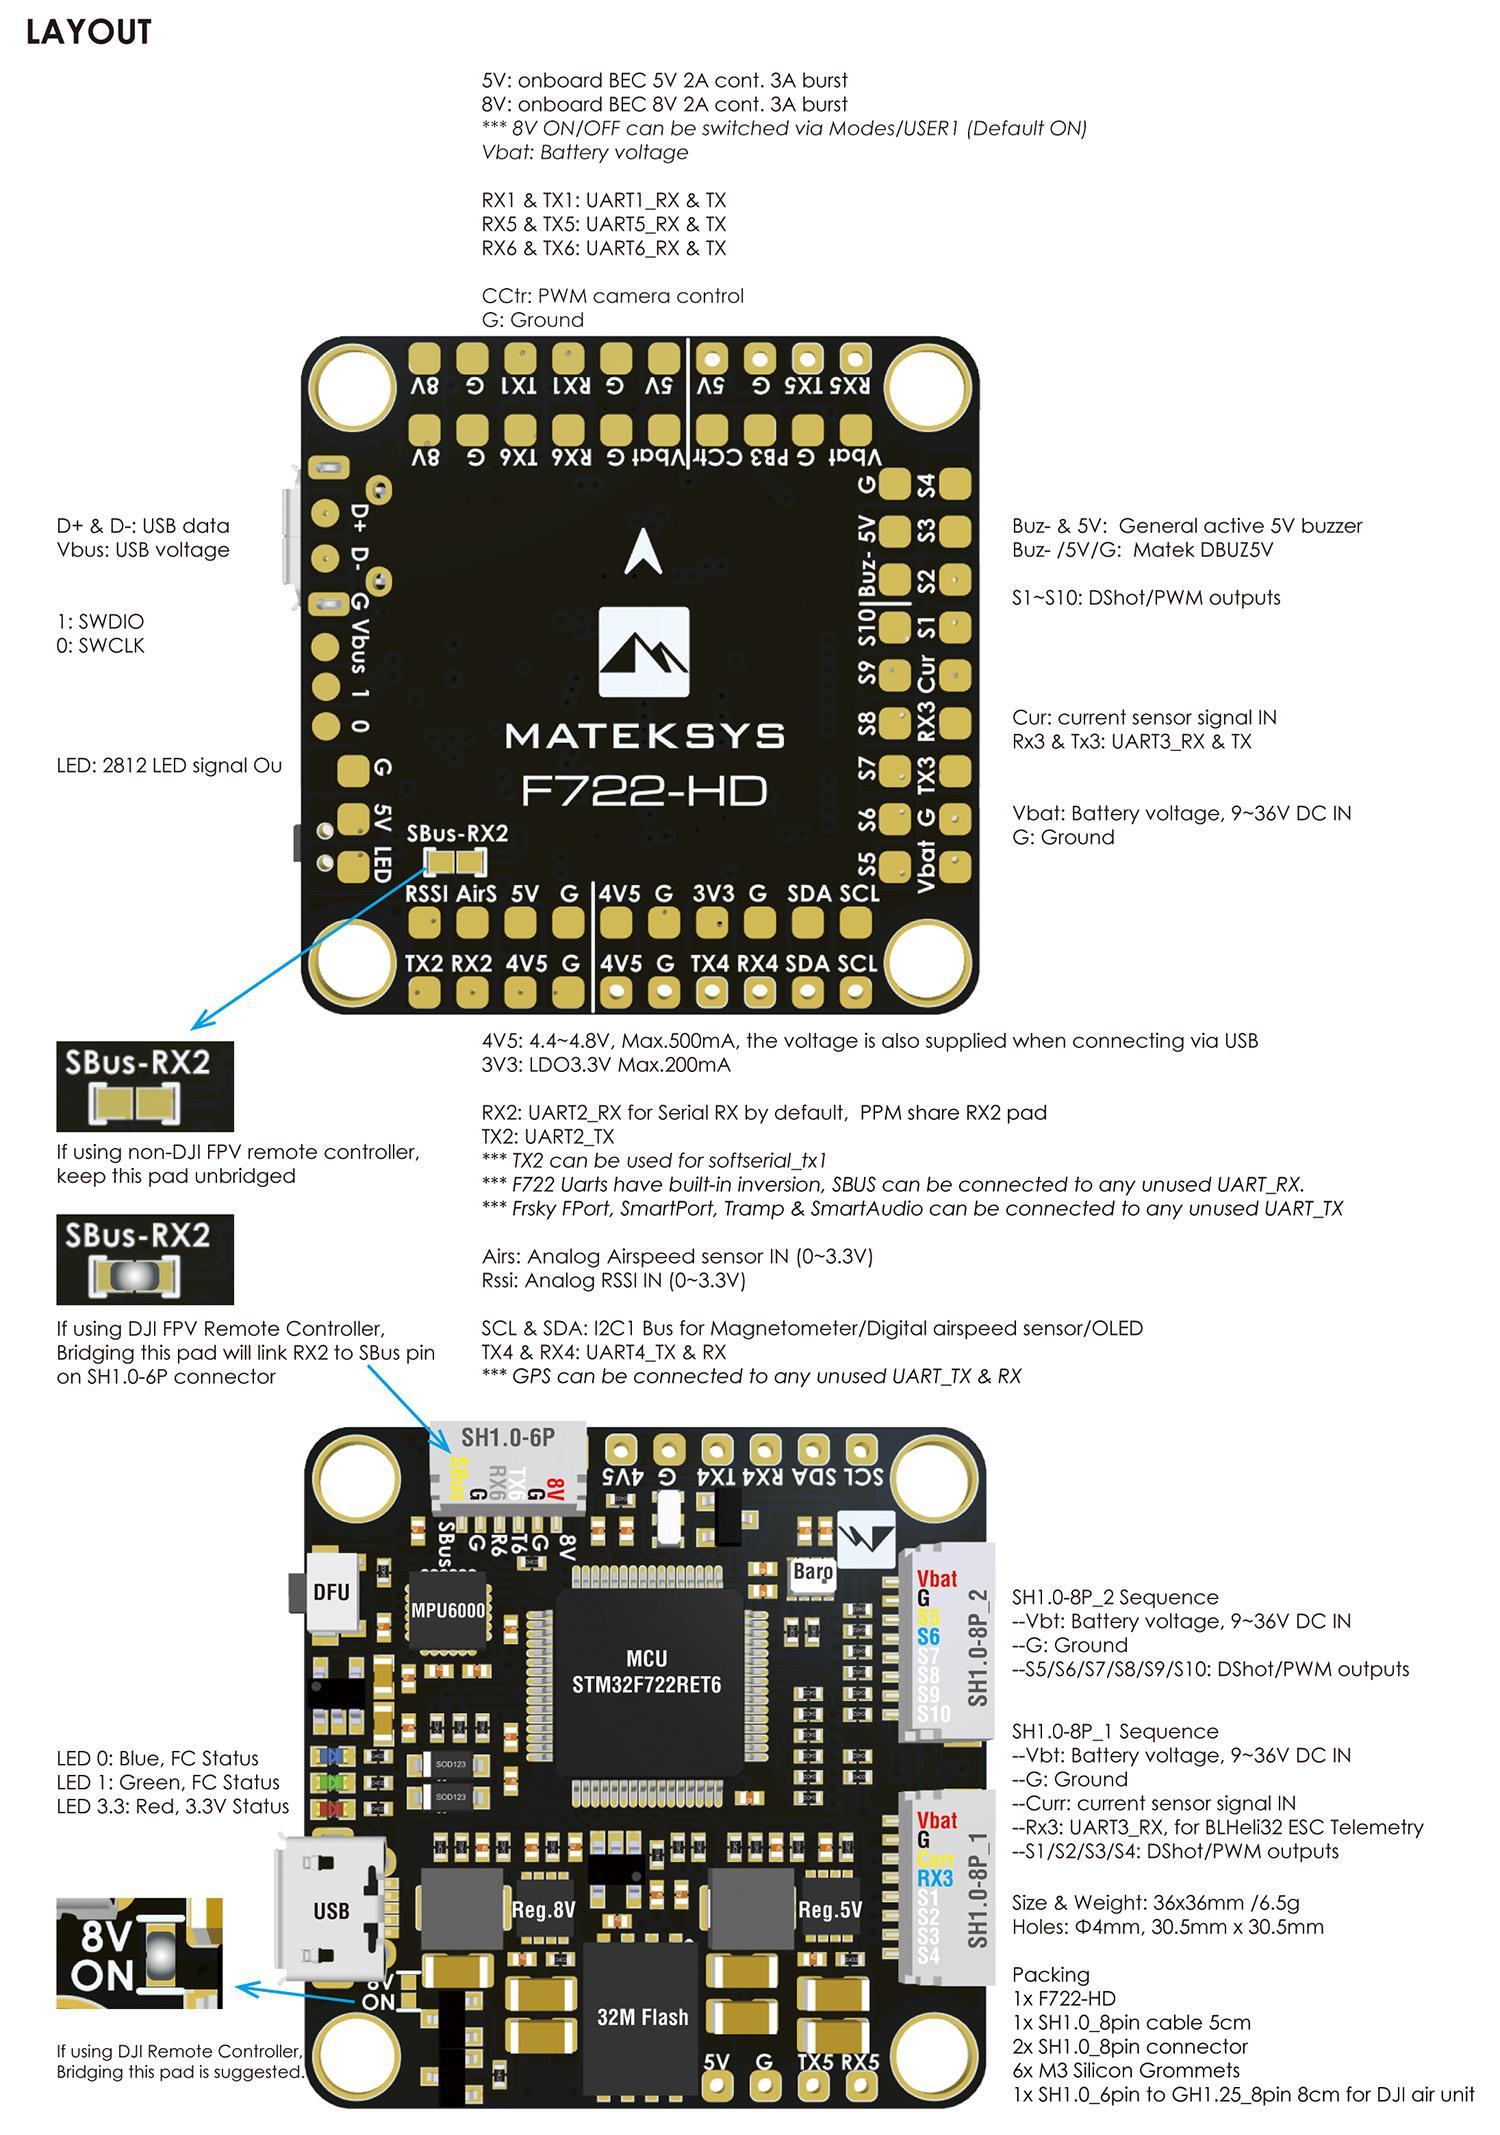 f722-hd-layout.jpg